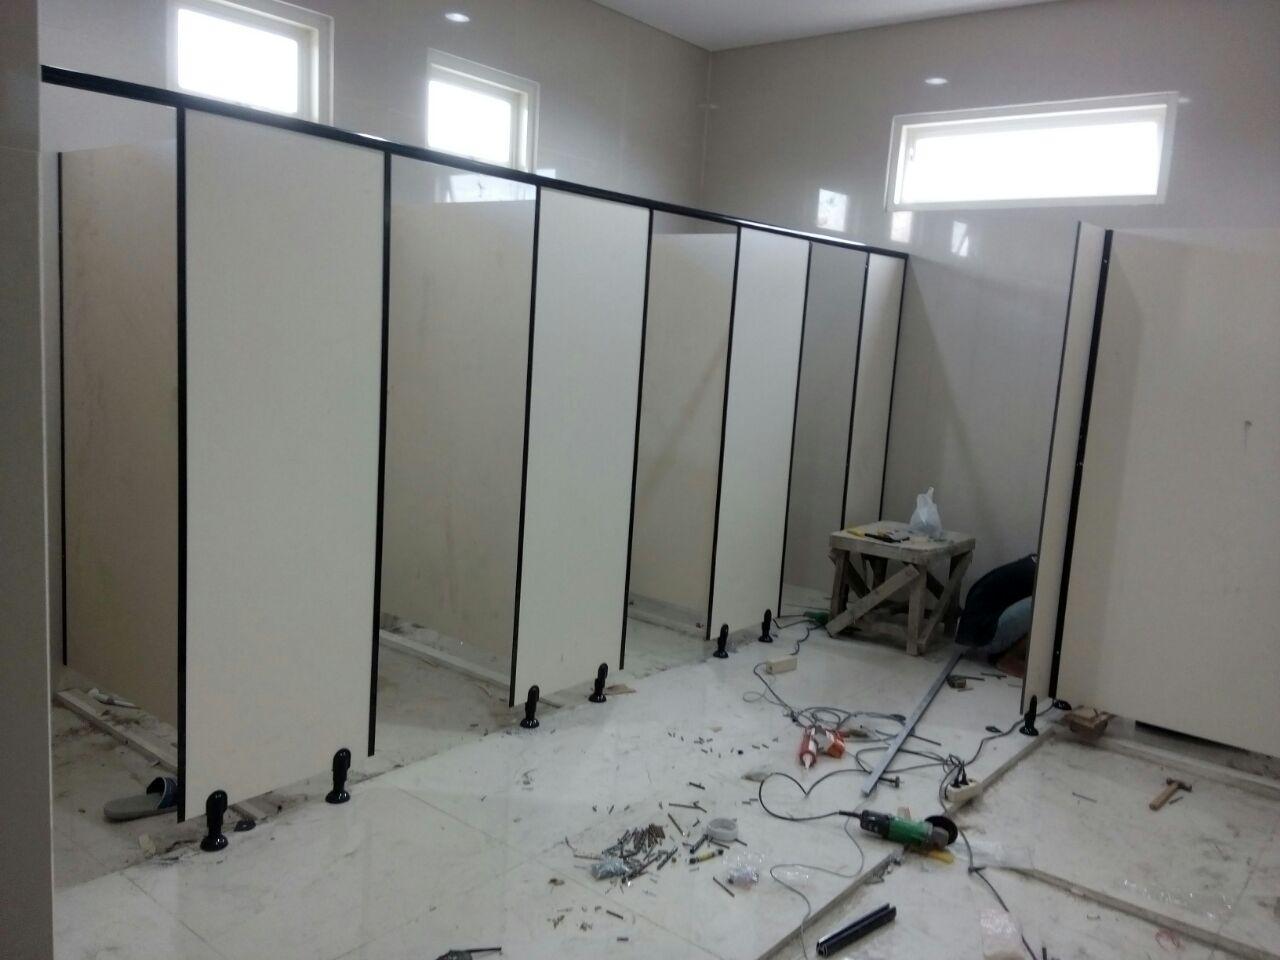 ToiletcubicleuntukSMAMuhammadiyah10-4